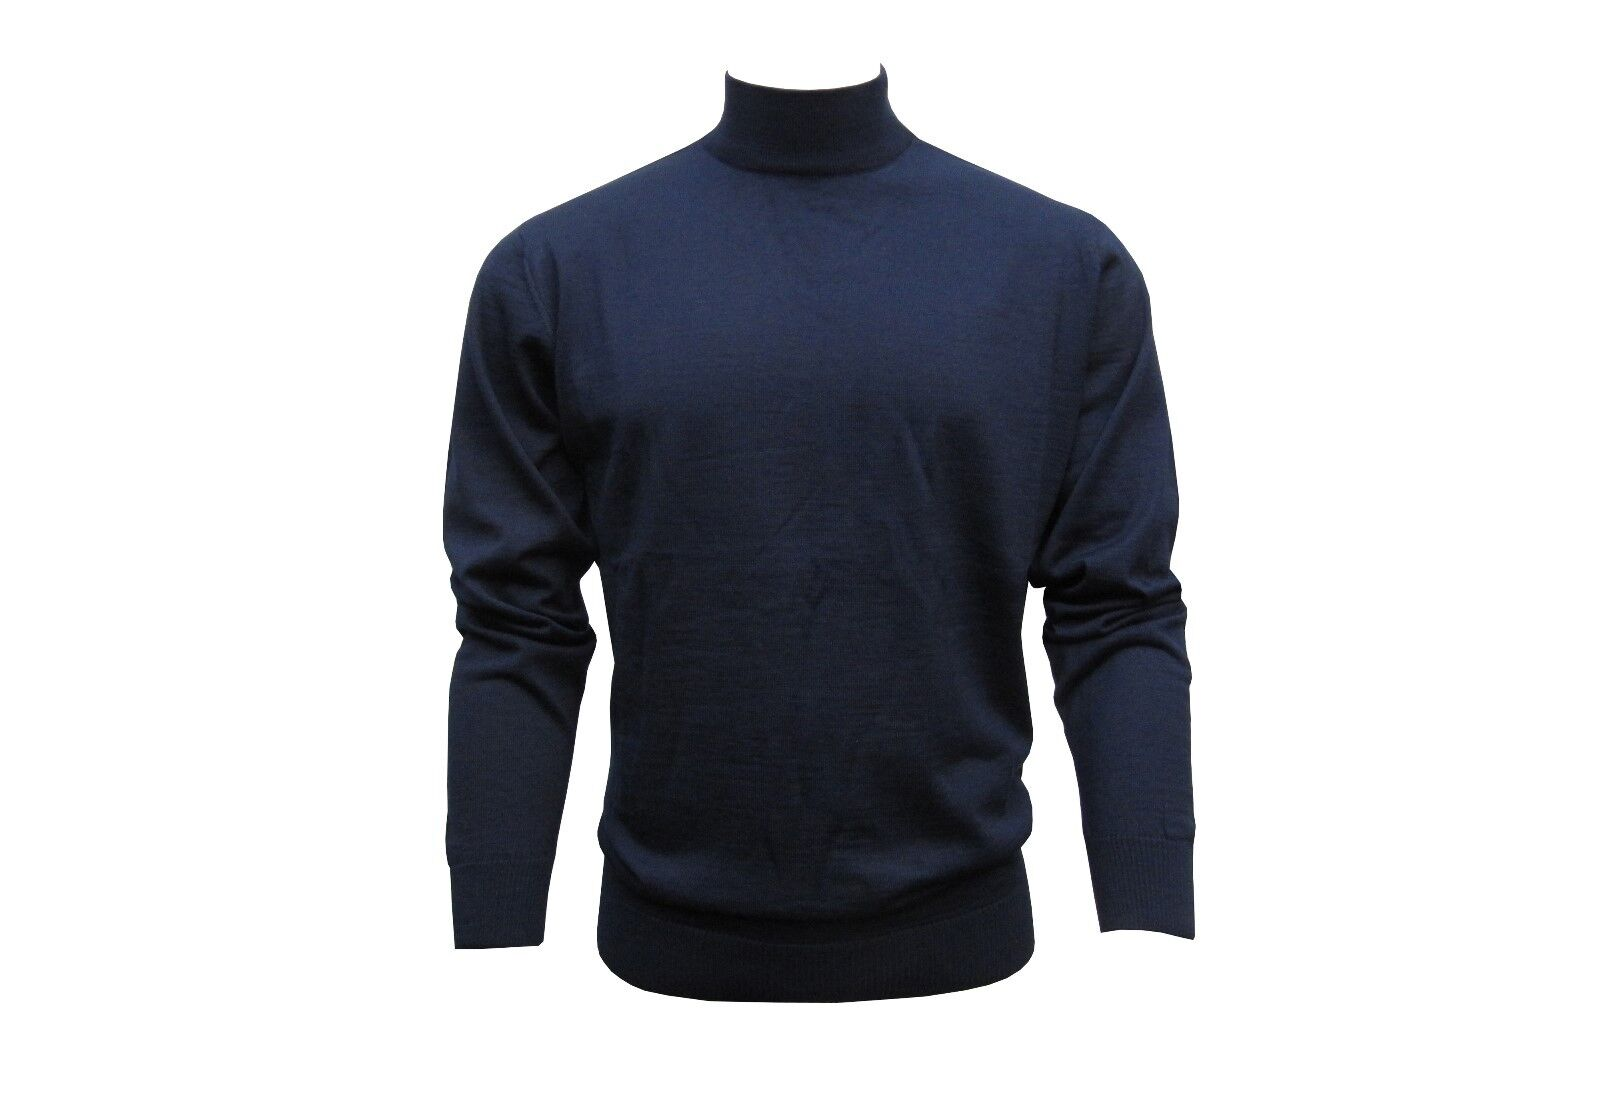 Stehkragen Stehkragen Stehkragen Herren Pullover Gr.L Marine Blau   Große Ausverkauf  1aae1a